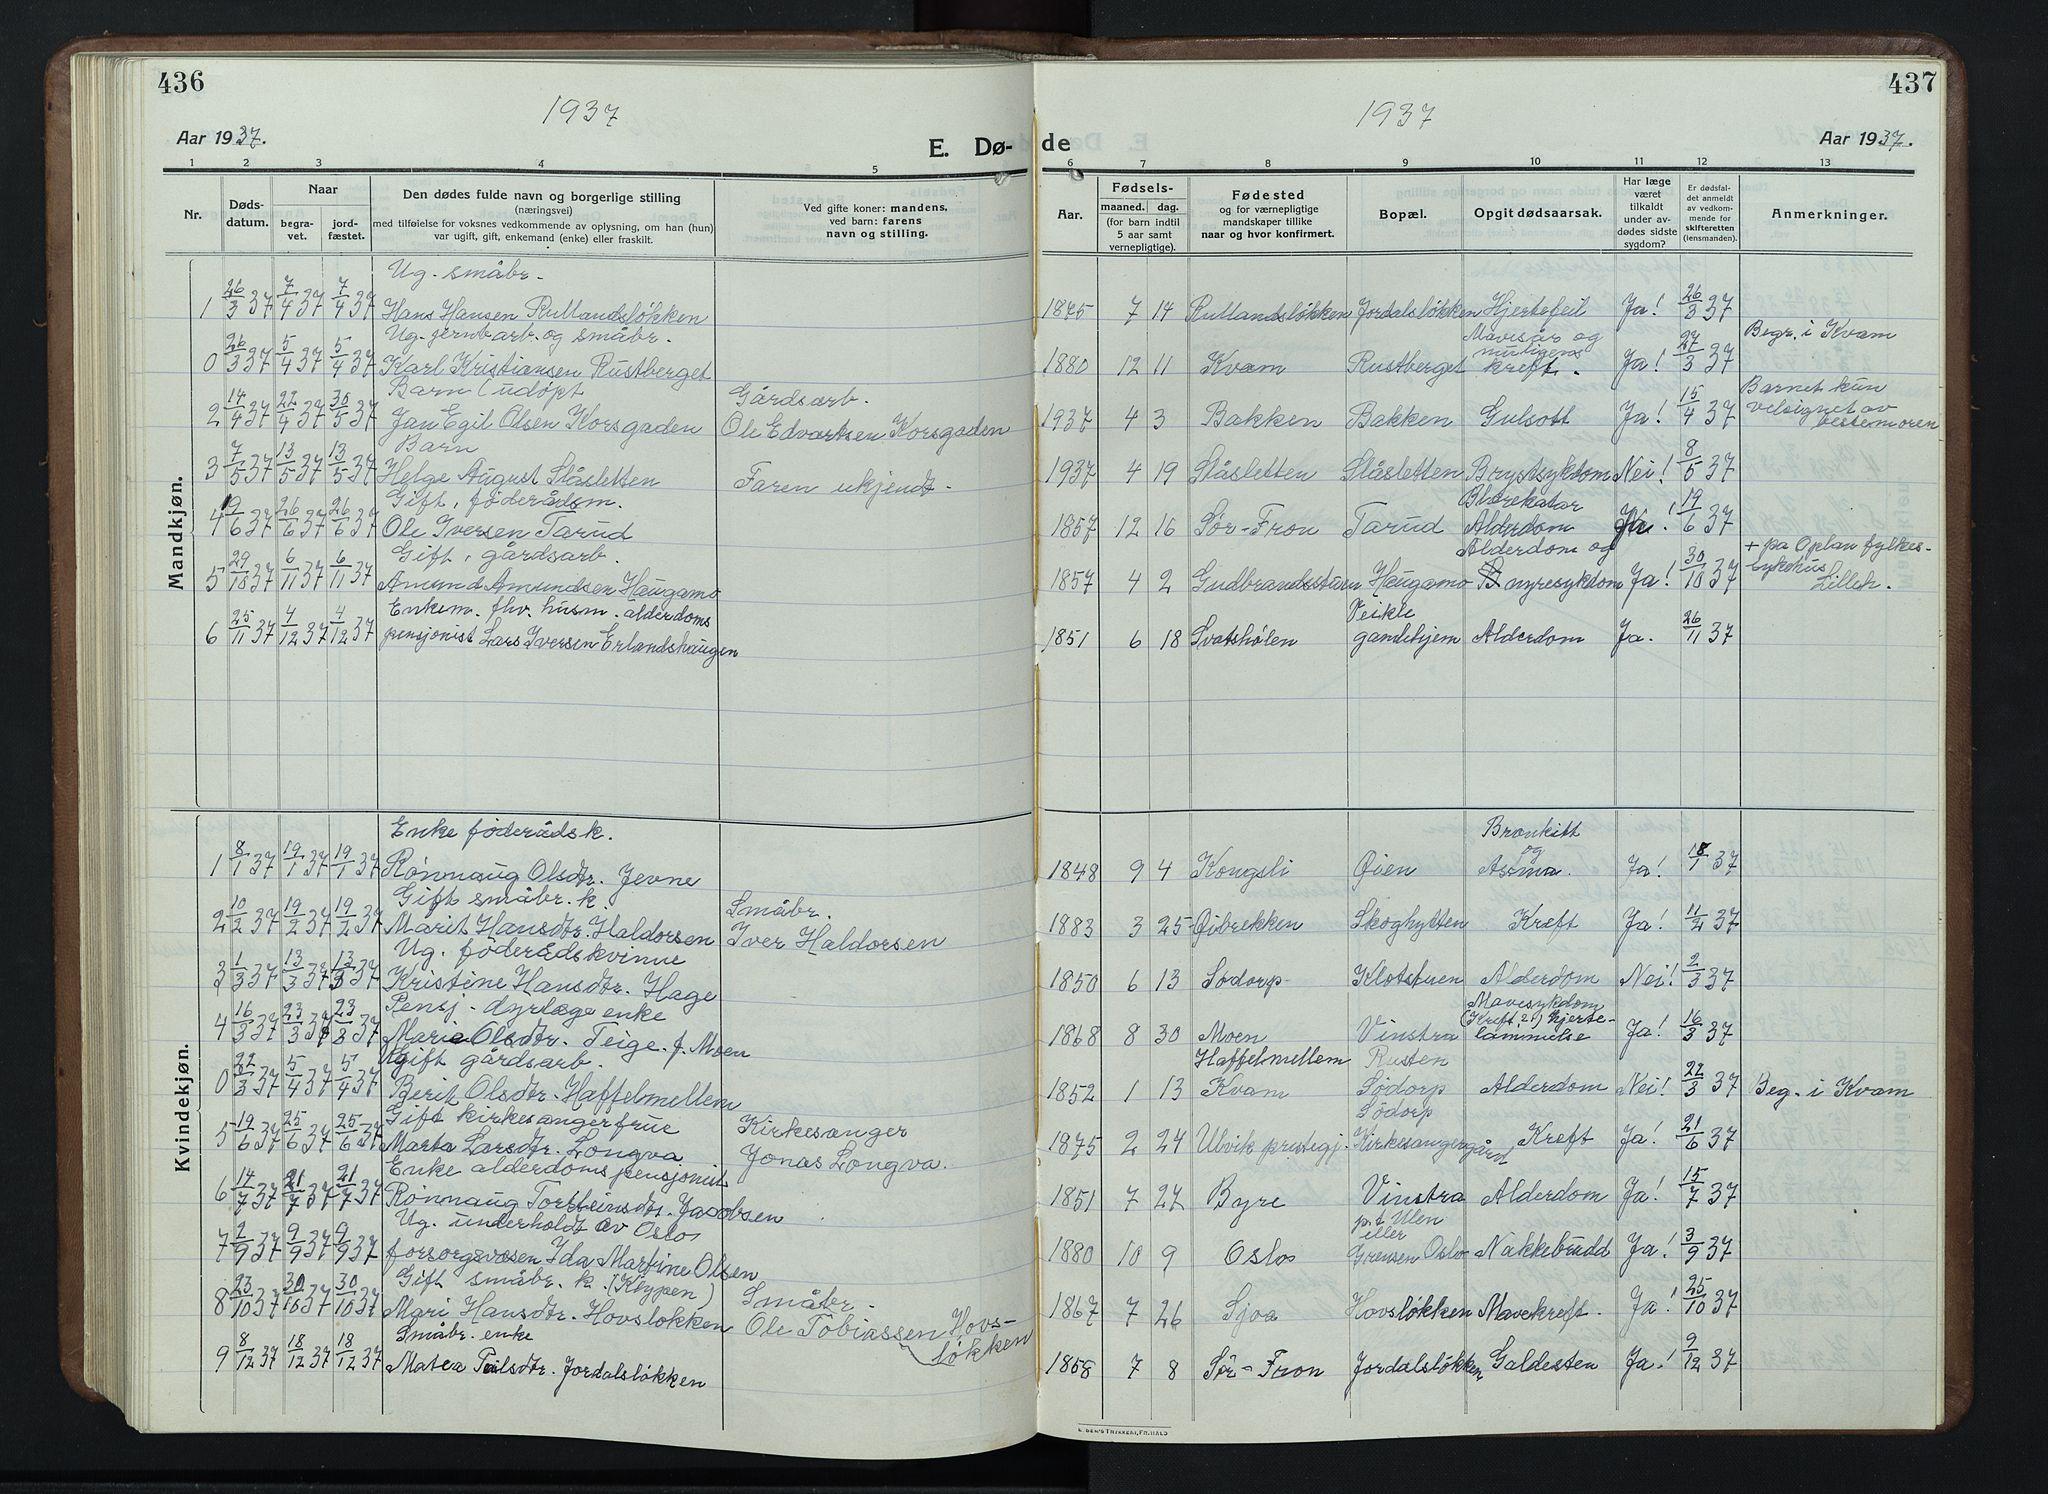 SAH, Nord-Fron prestekontor, Klokkerbok nr. 7, 1915-1946, s. 436-437